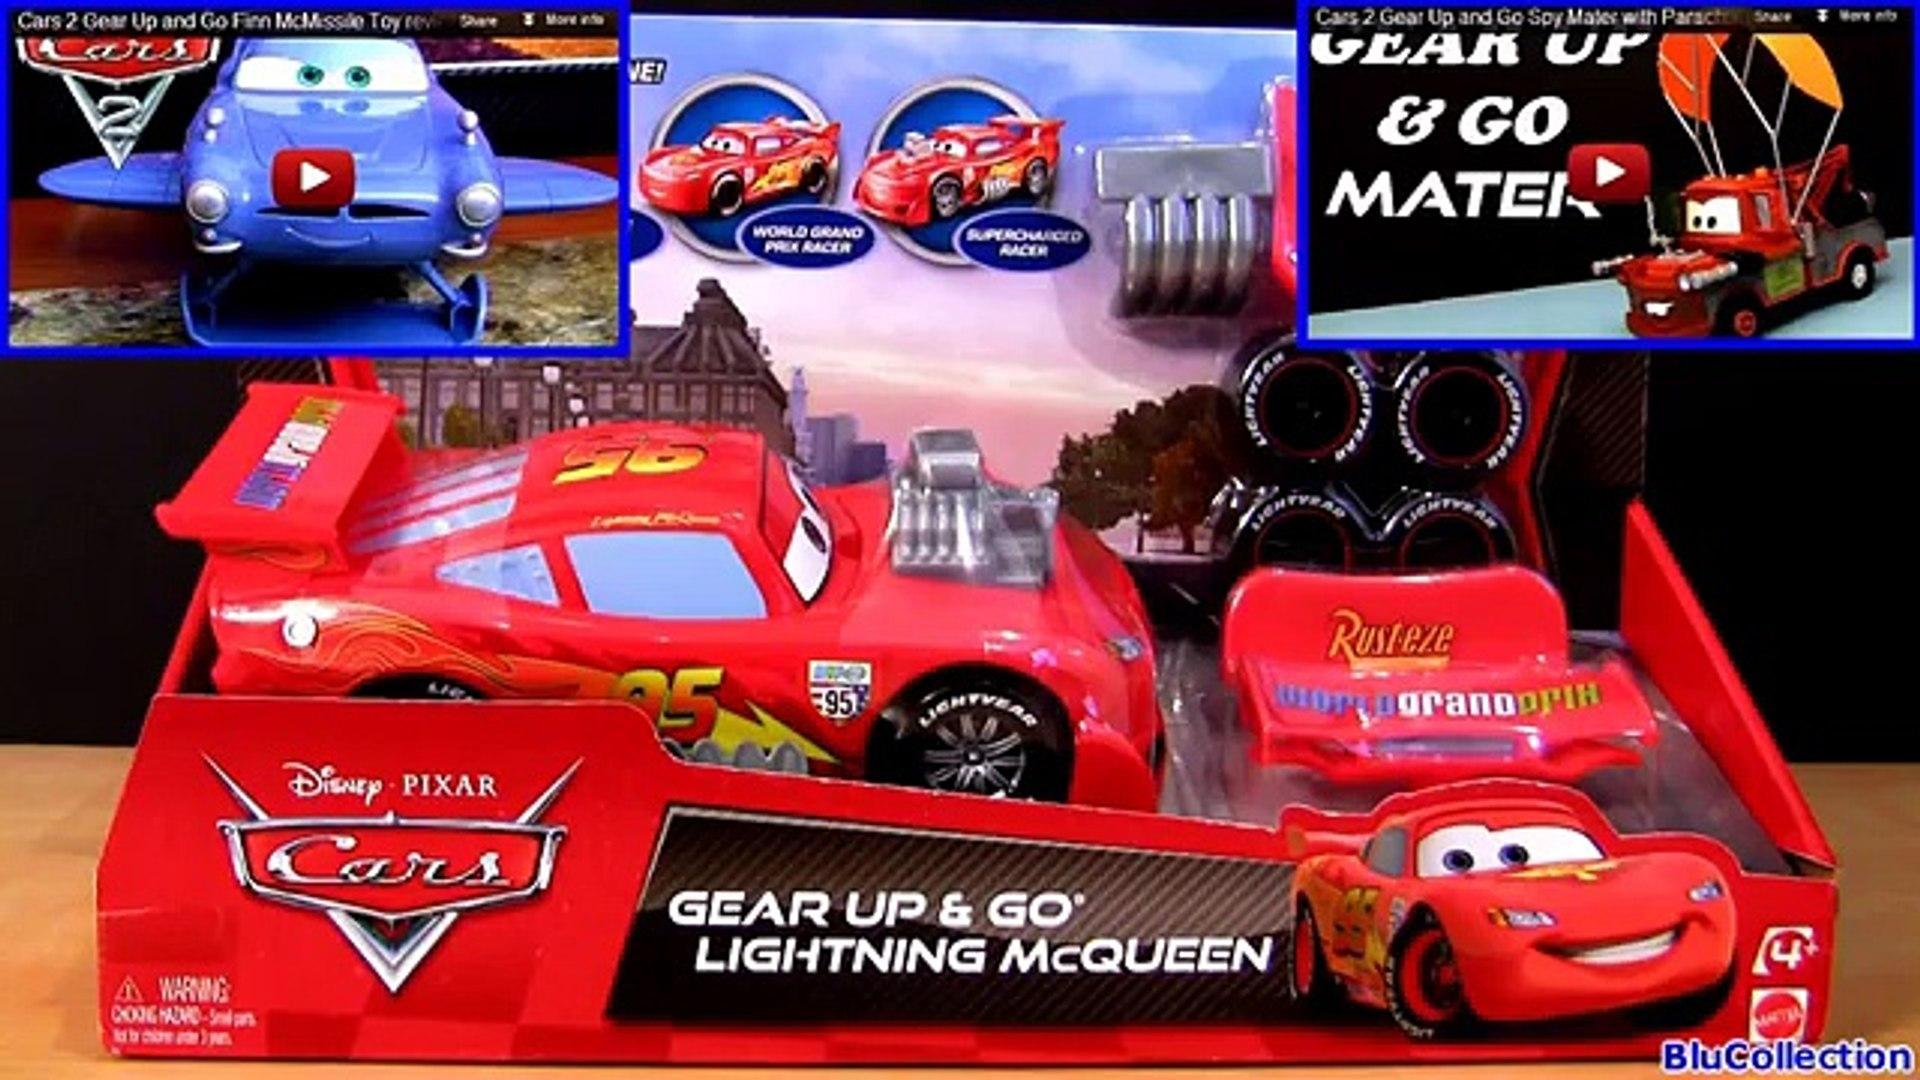 Carrinho Relampago Mcqueen Gear Up N Go Disney Pixar Cars 2 Flash